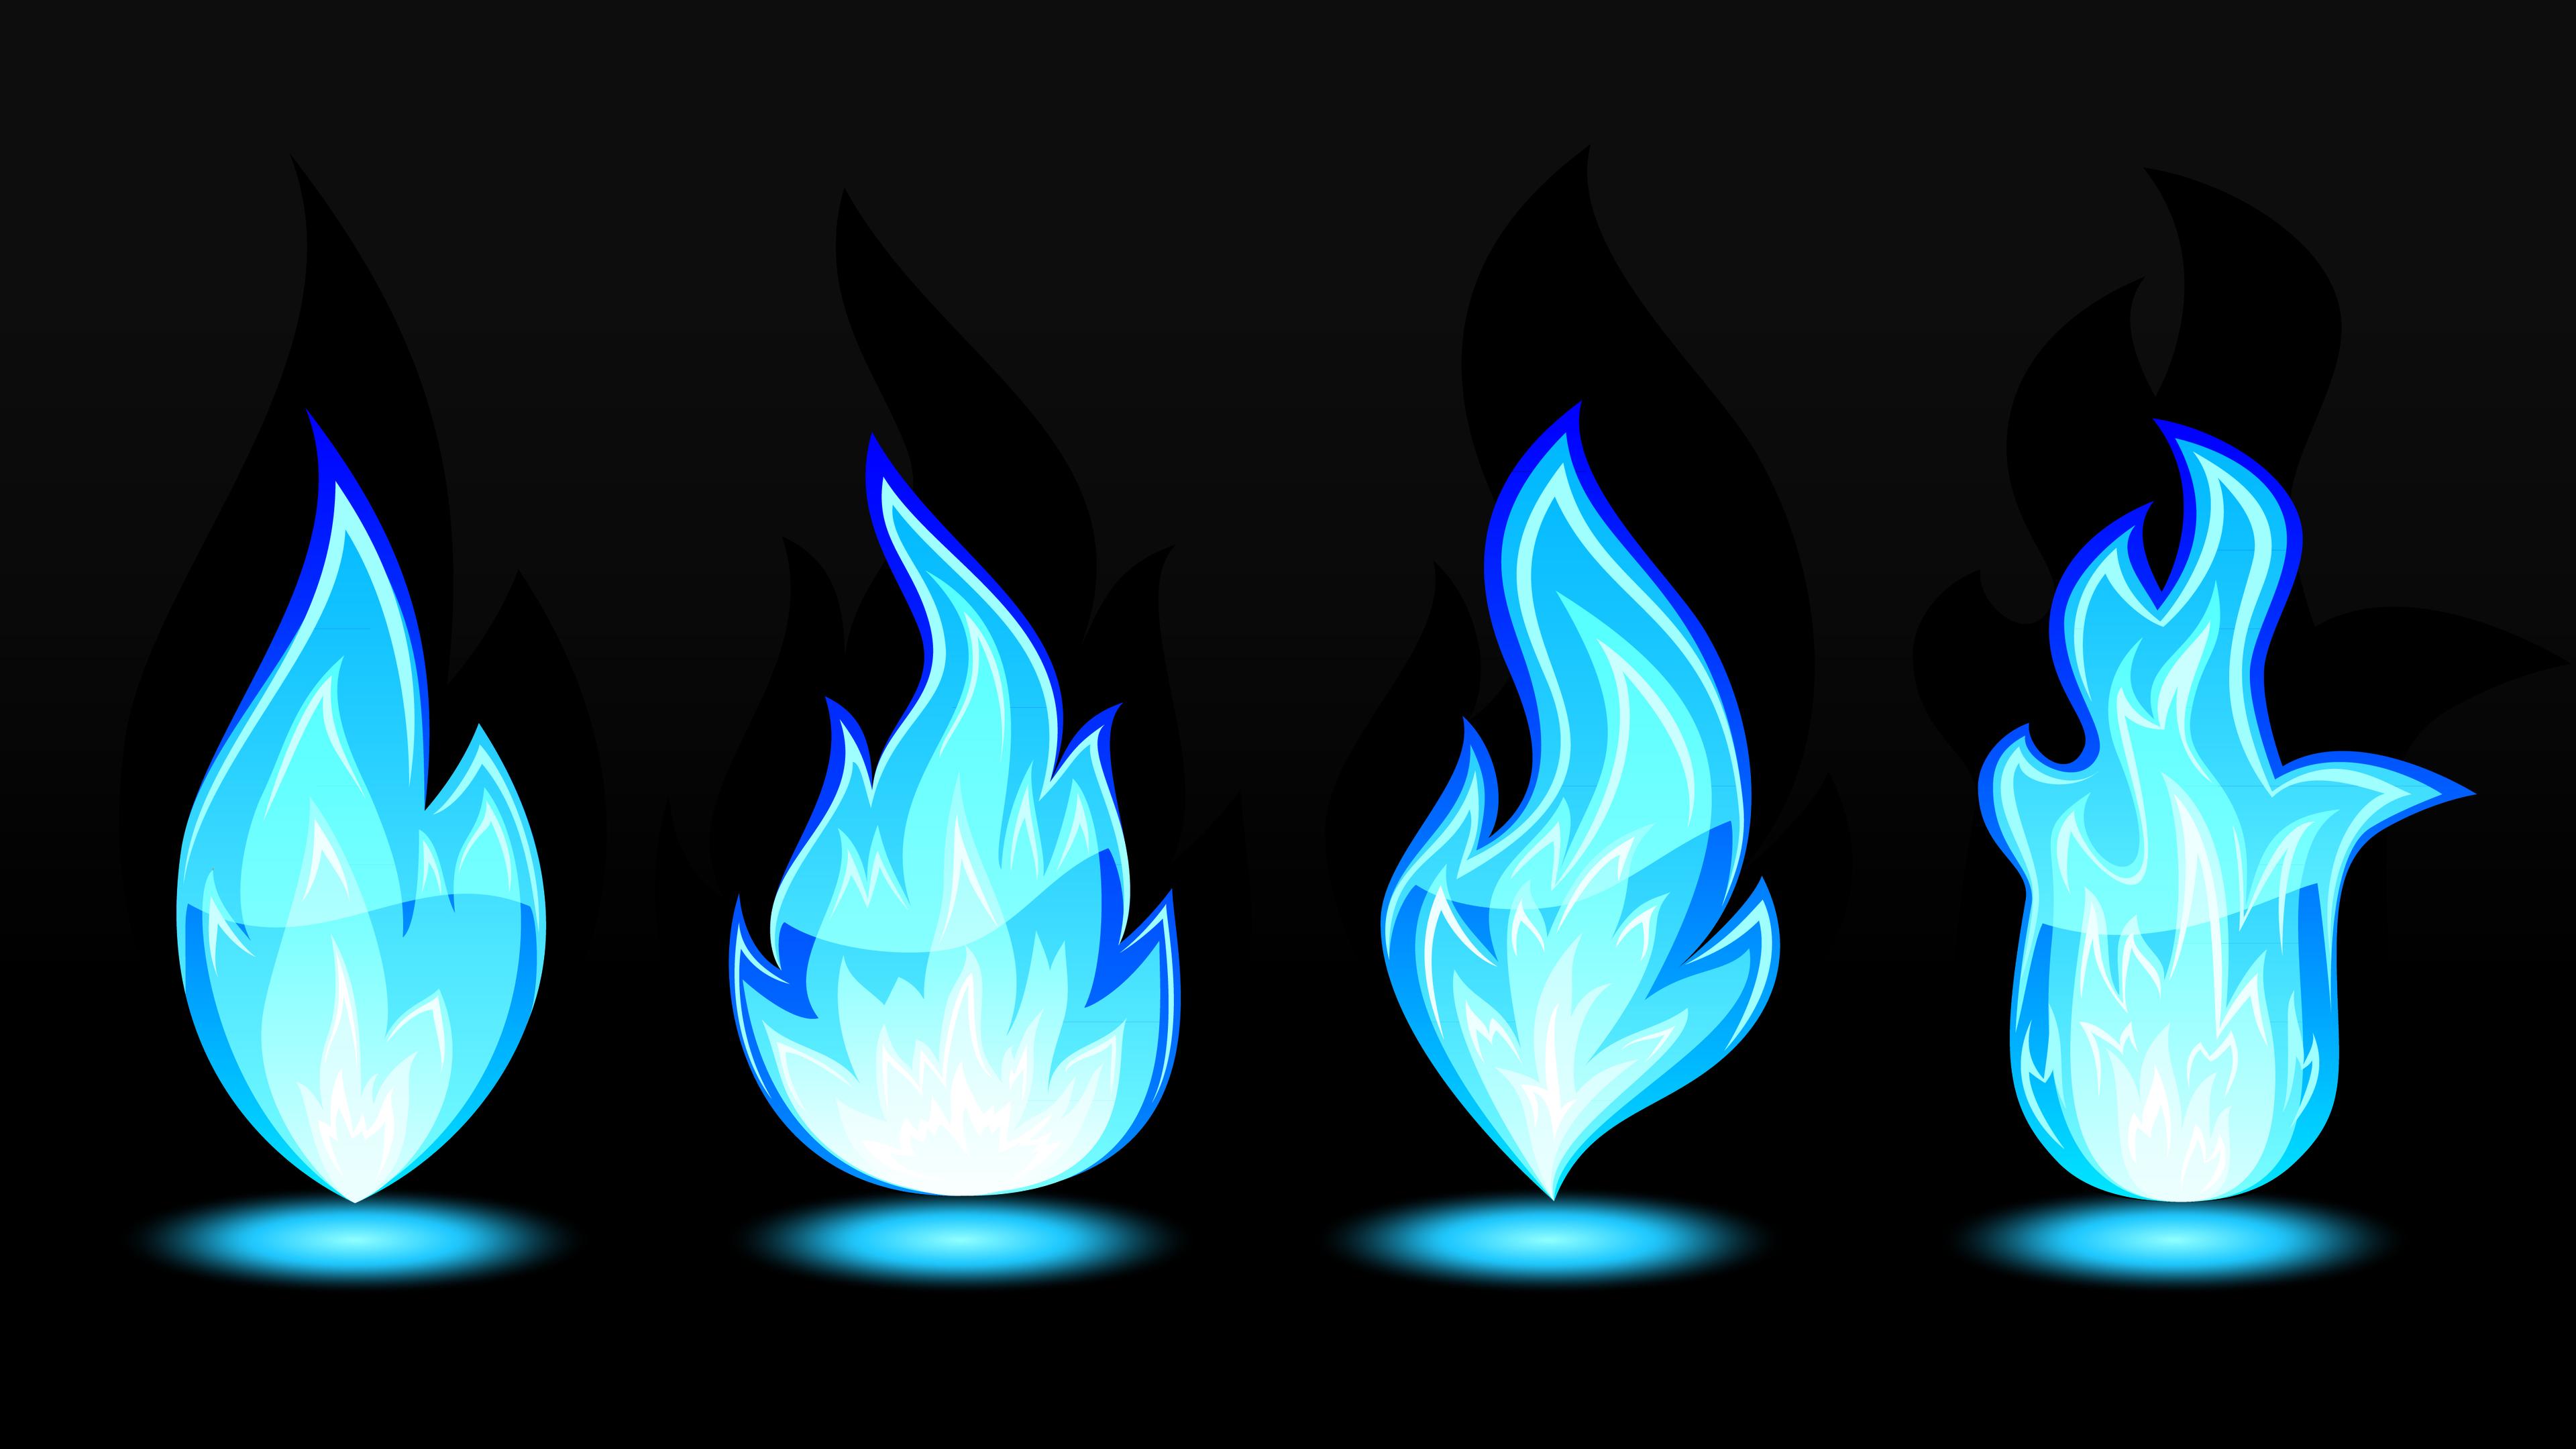 flames art 1540748175 - Flames Art - flame wallpapers, digital art wallpapers, artist wallpapers, art wallpapers